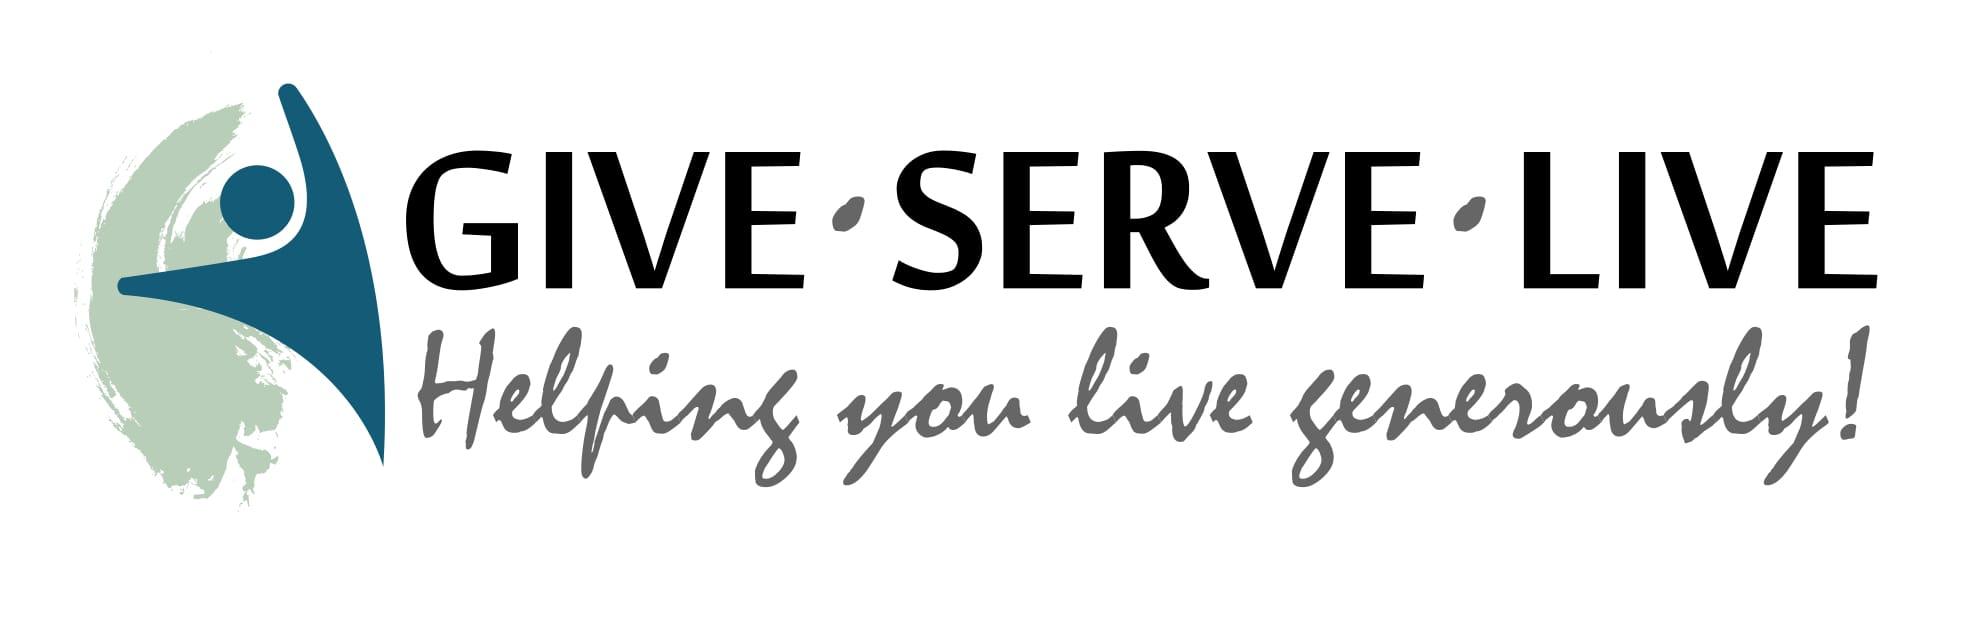 Give Serve Live logo